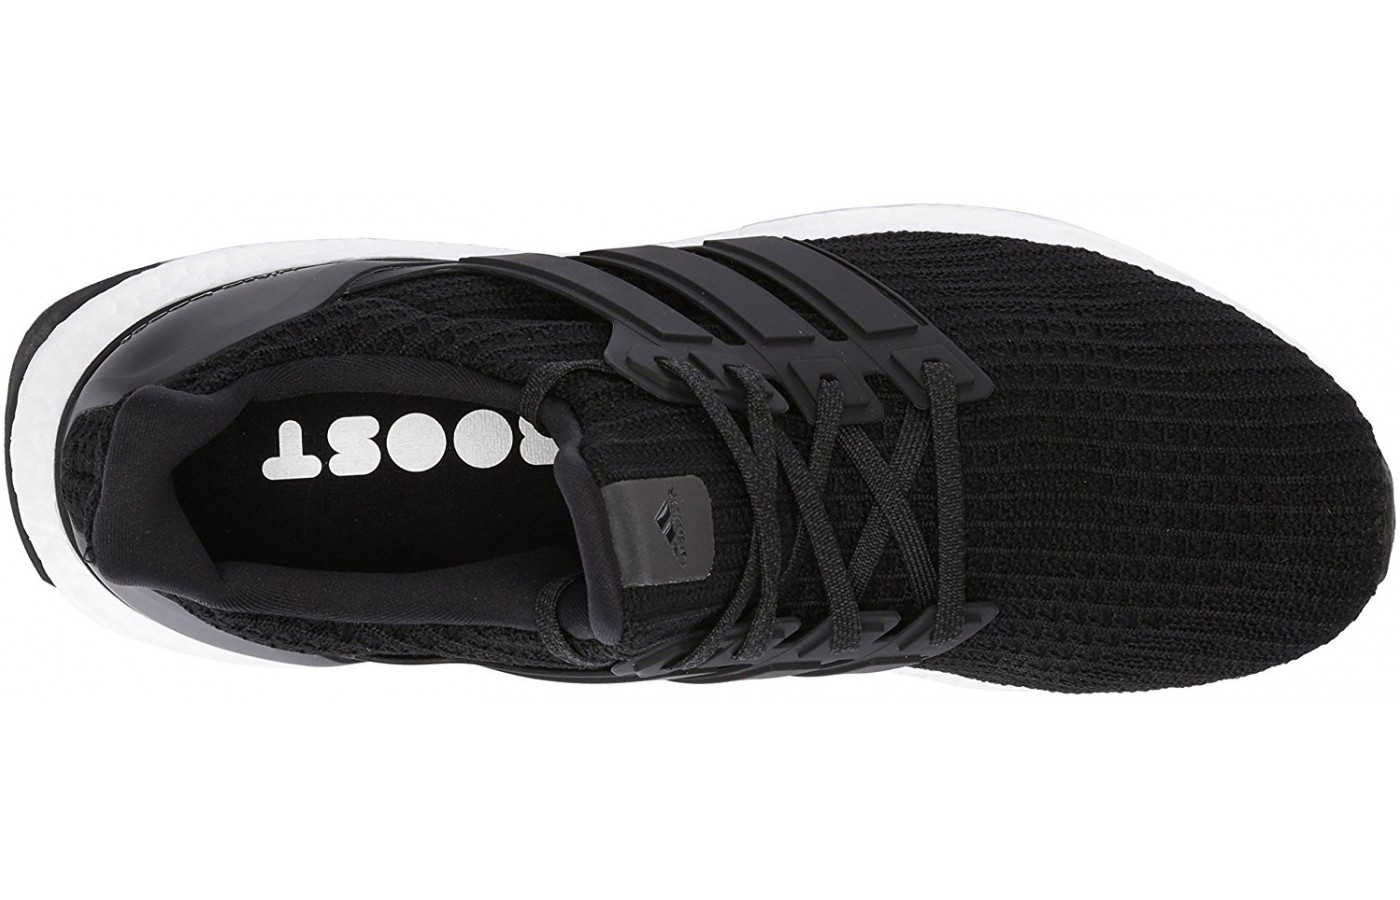 Adidas Ultraboost upper